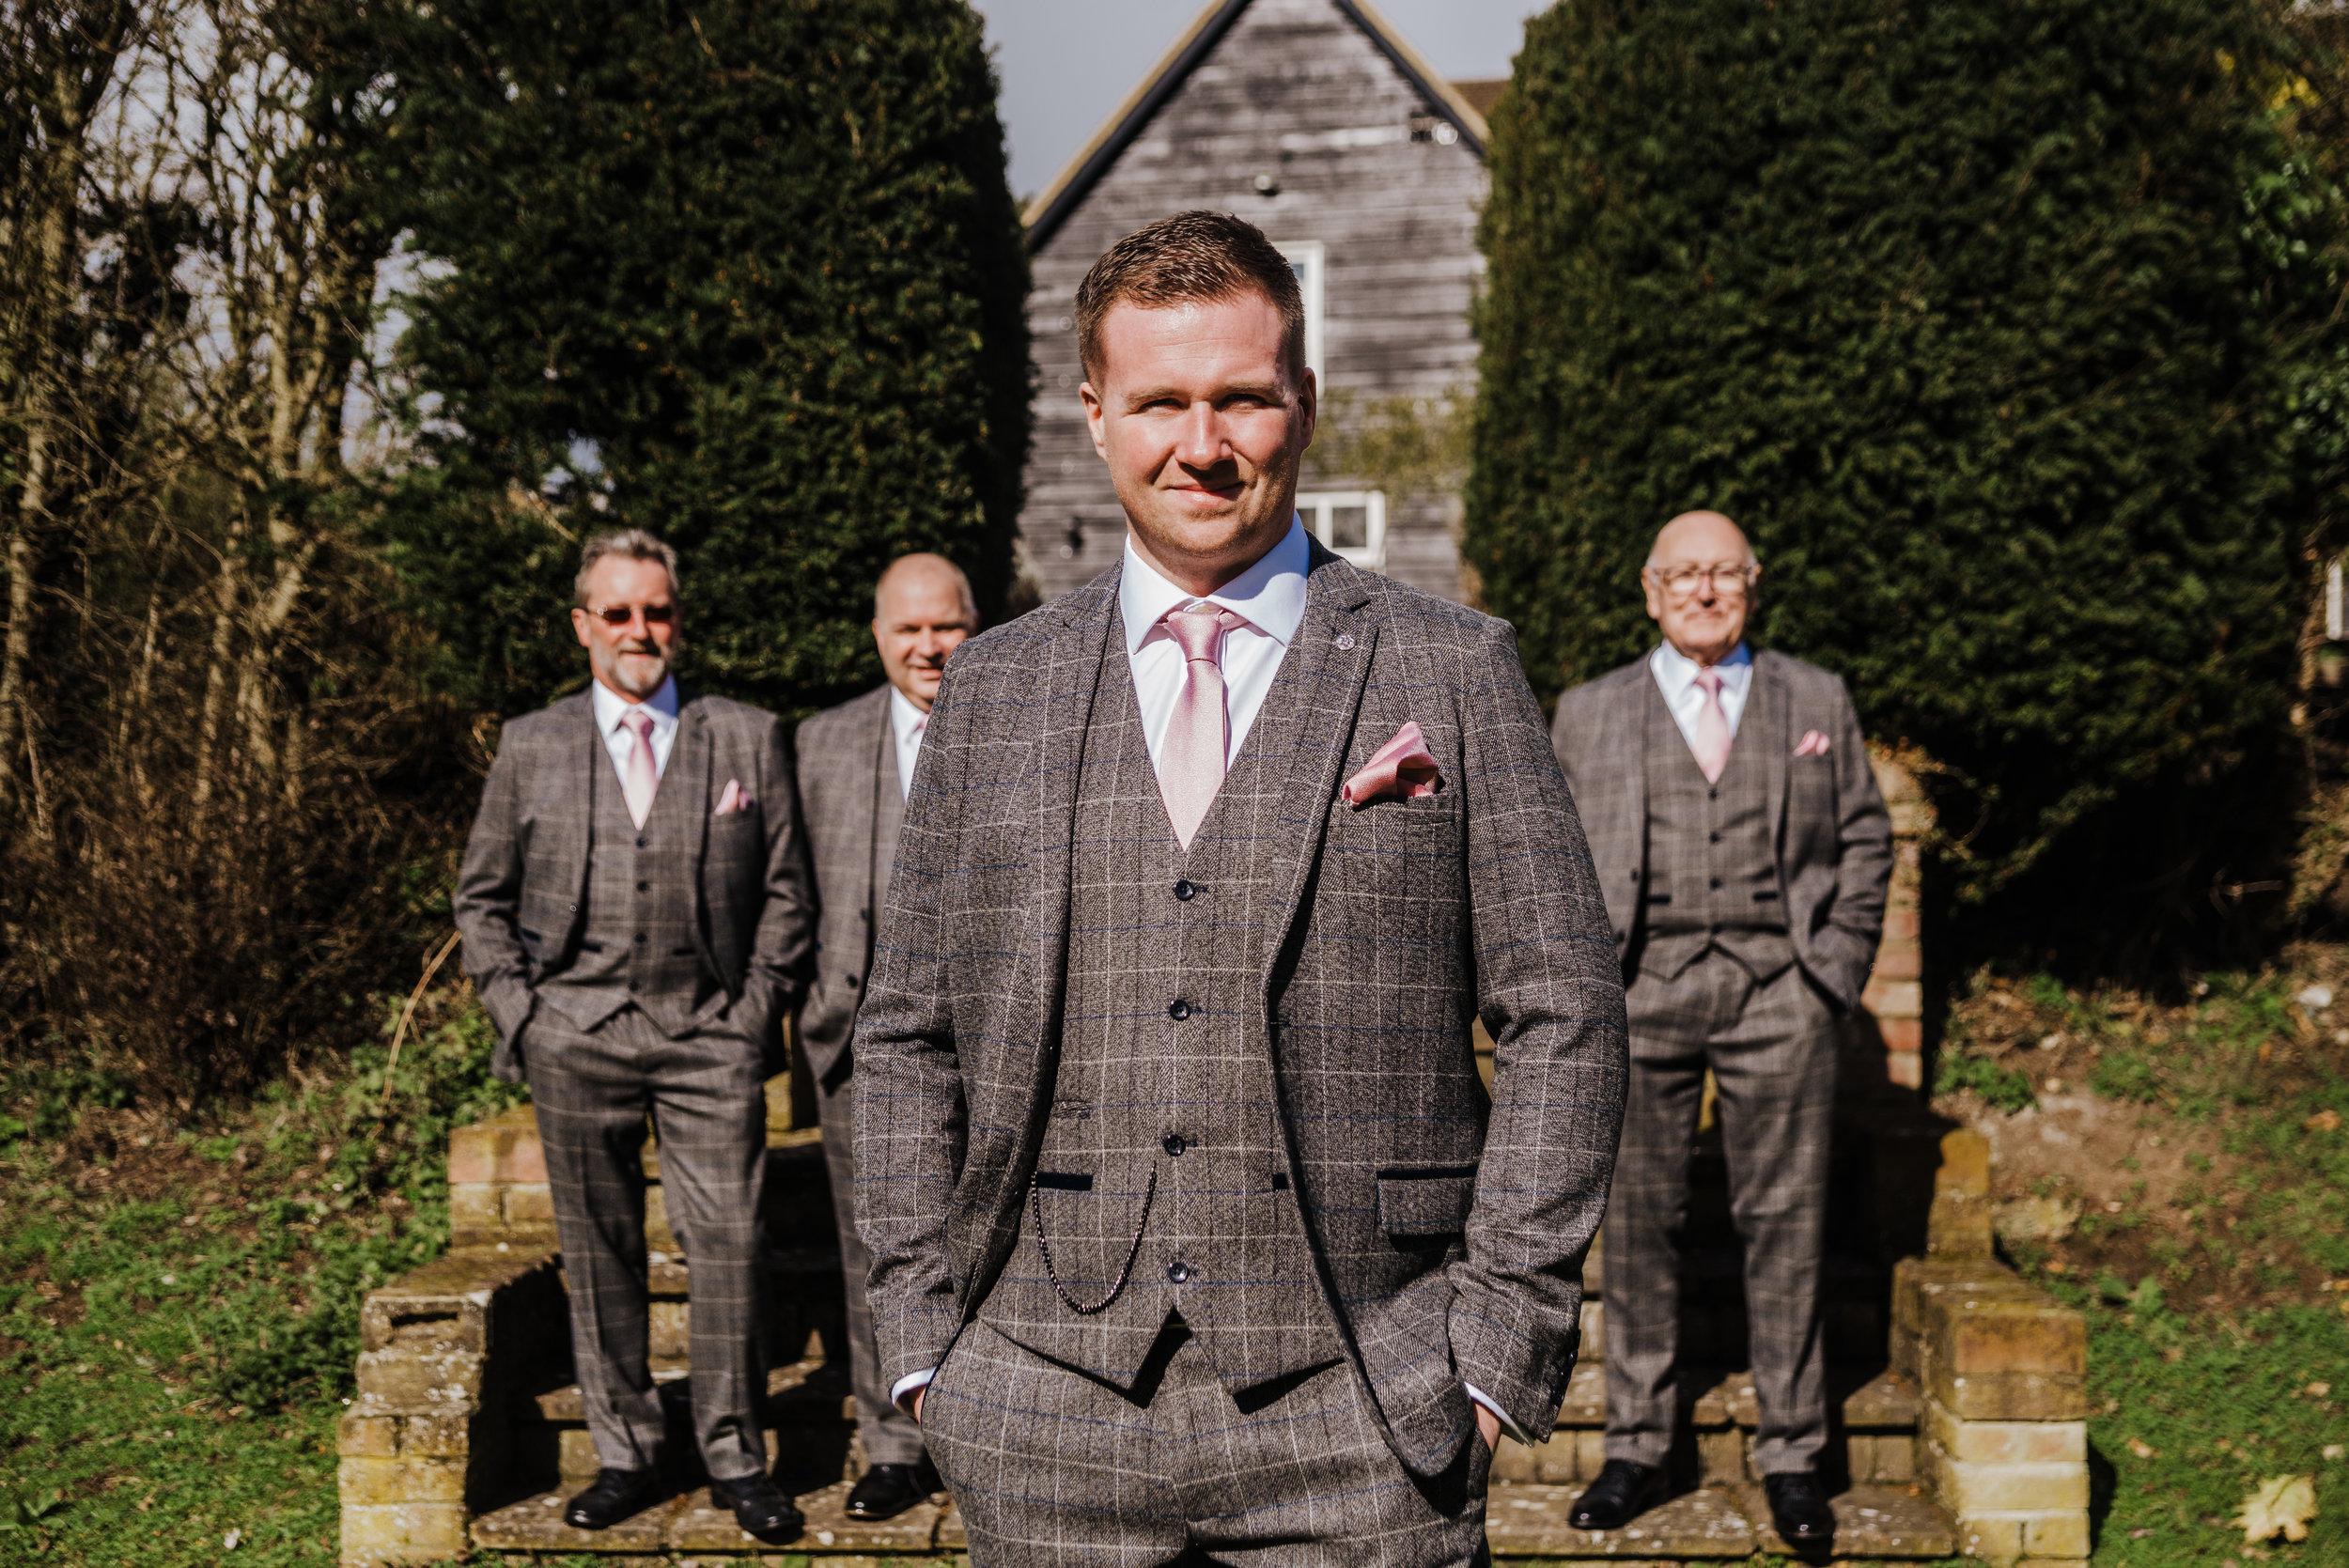 Konjo-Photography-Essex-Suffolk-Norfolk-Wedding-Photographer-And-Videographer-Wedding-Videography (8).JPG